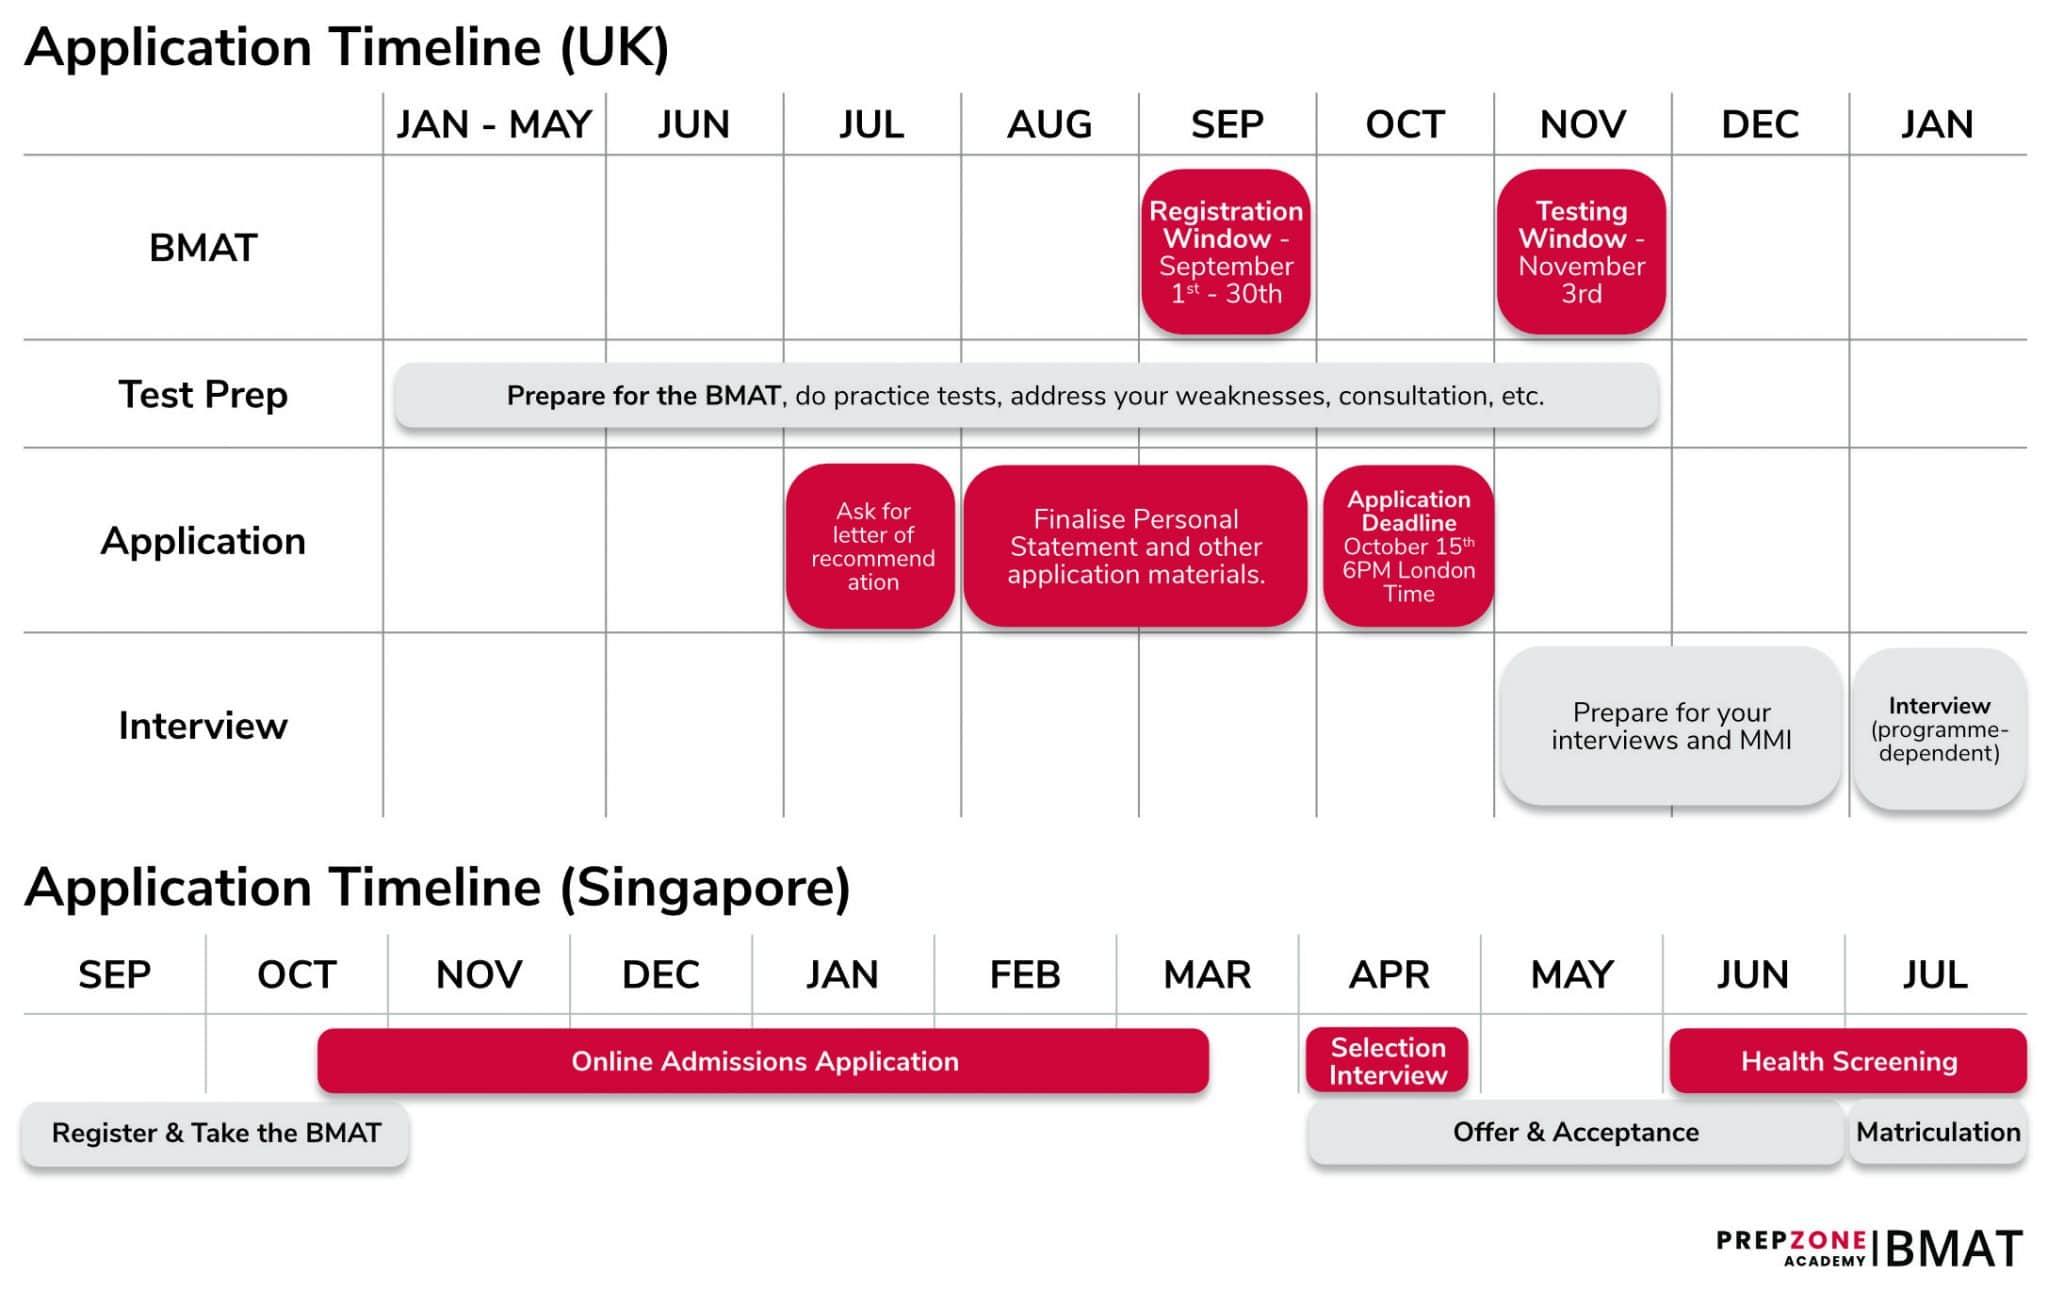 BMAT Application Timeline 2021 scaled